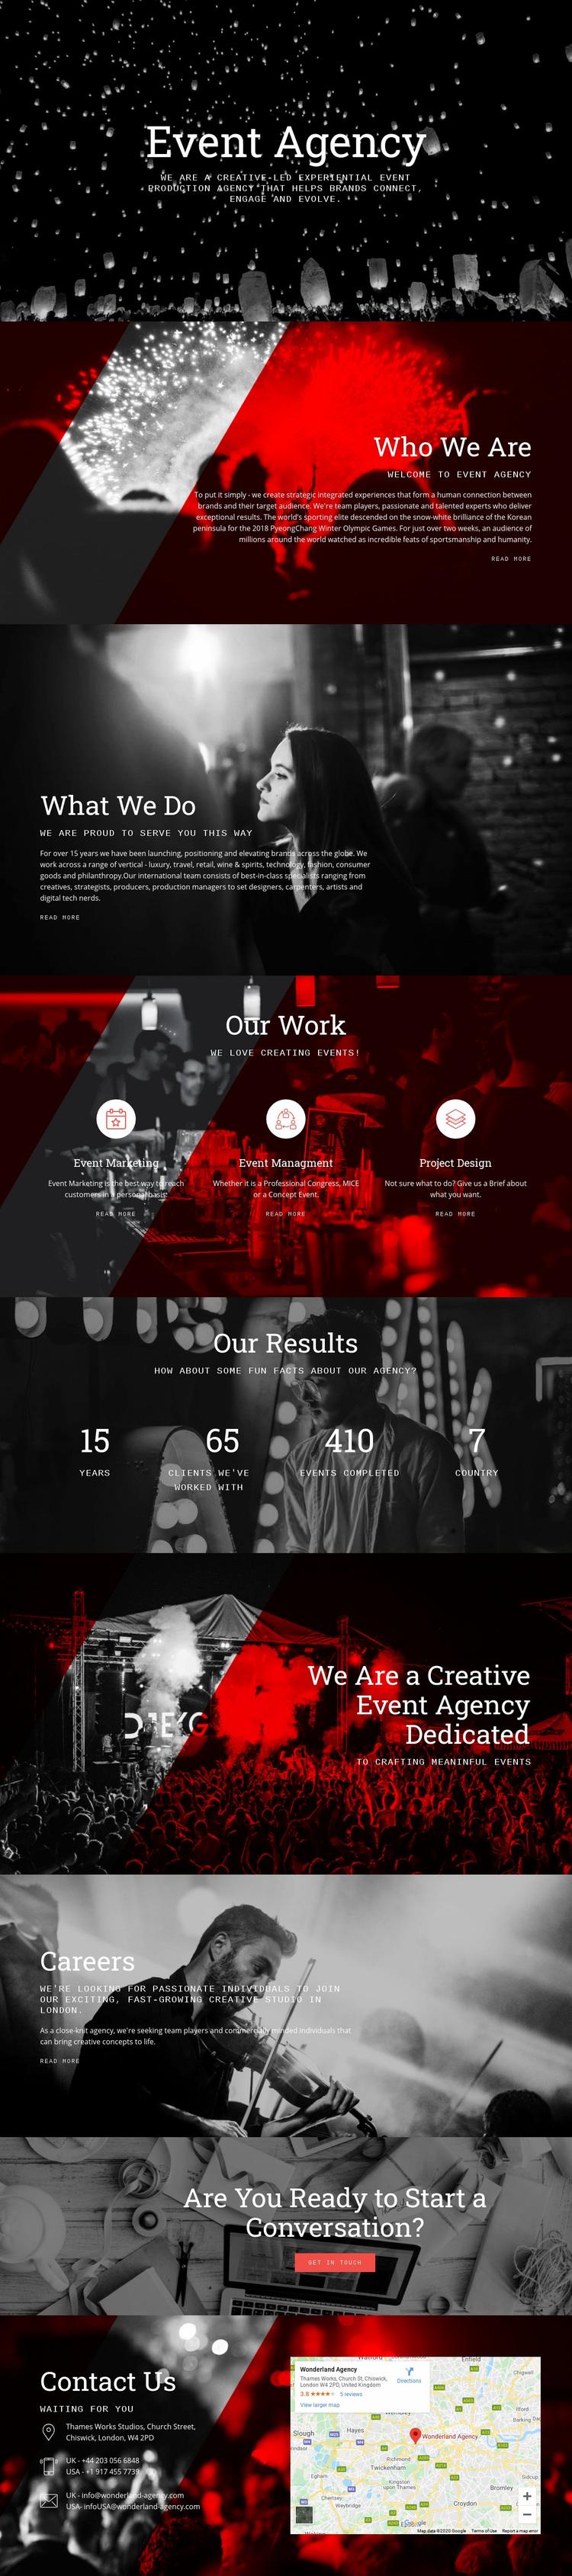 Event Agency Web Page Designer